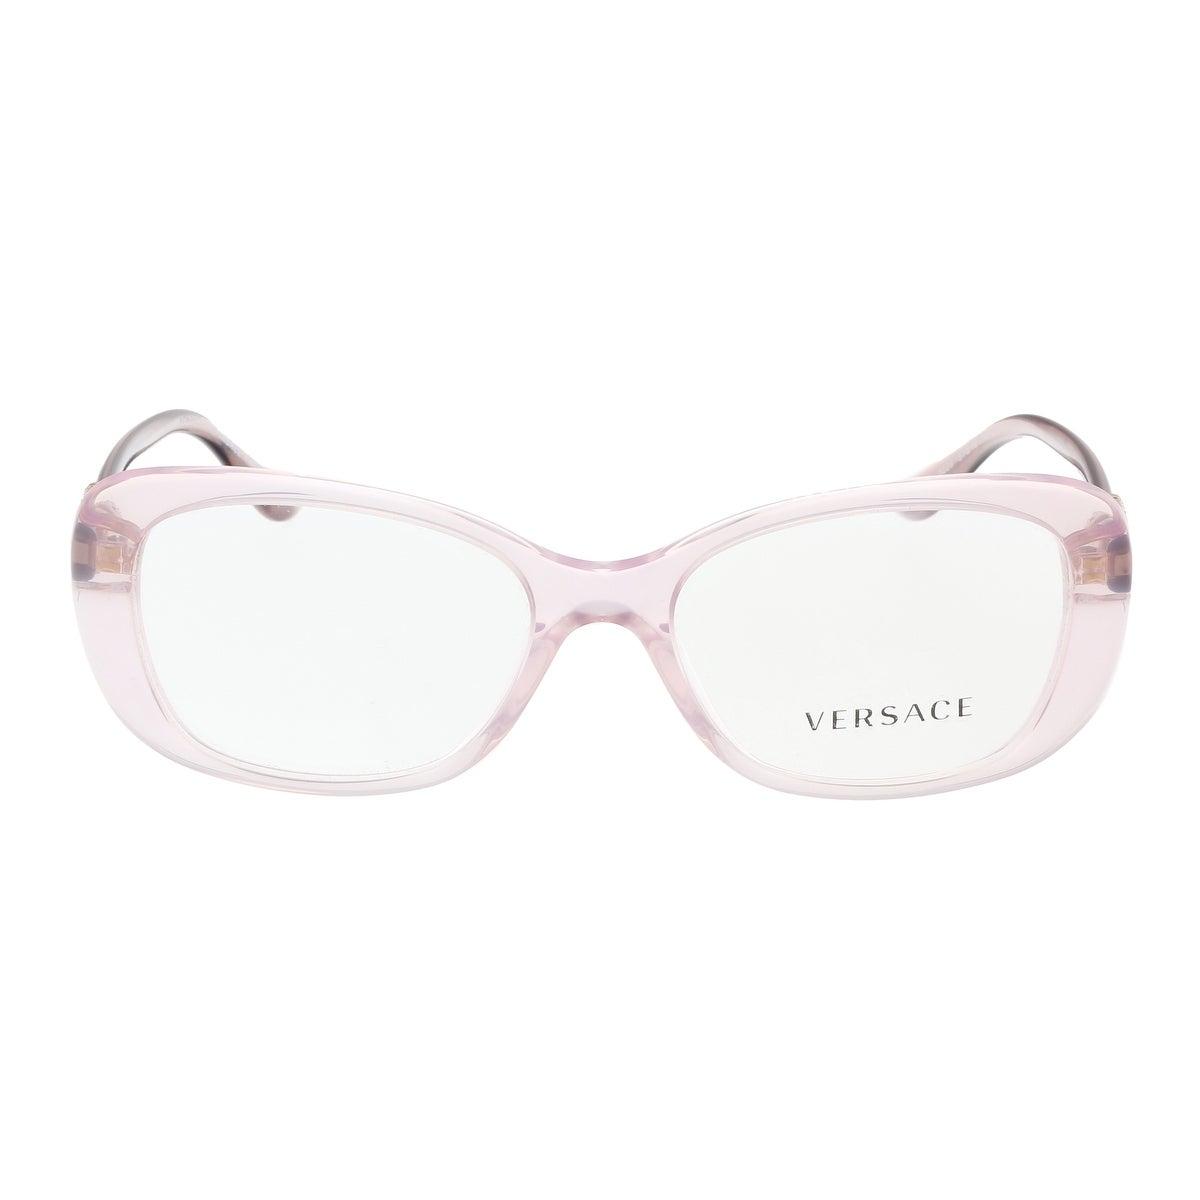 2471a1d4b75b Shop Versace VE3234B 5223 Transparent Lilac Rectangle Optical Frames -  51-16-140 - Free Shipping Today - Overstock - 17768361